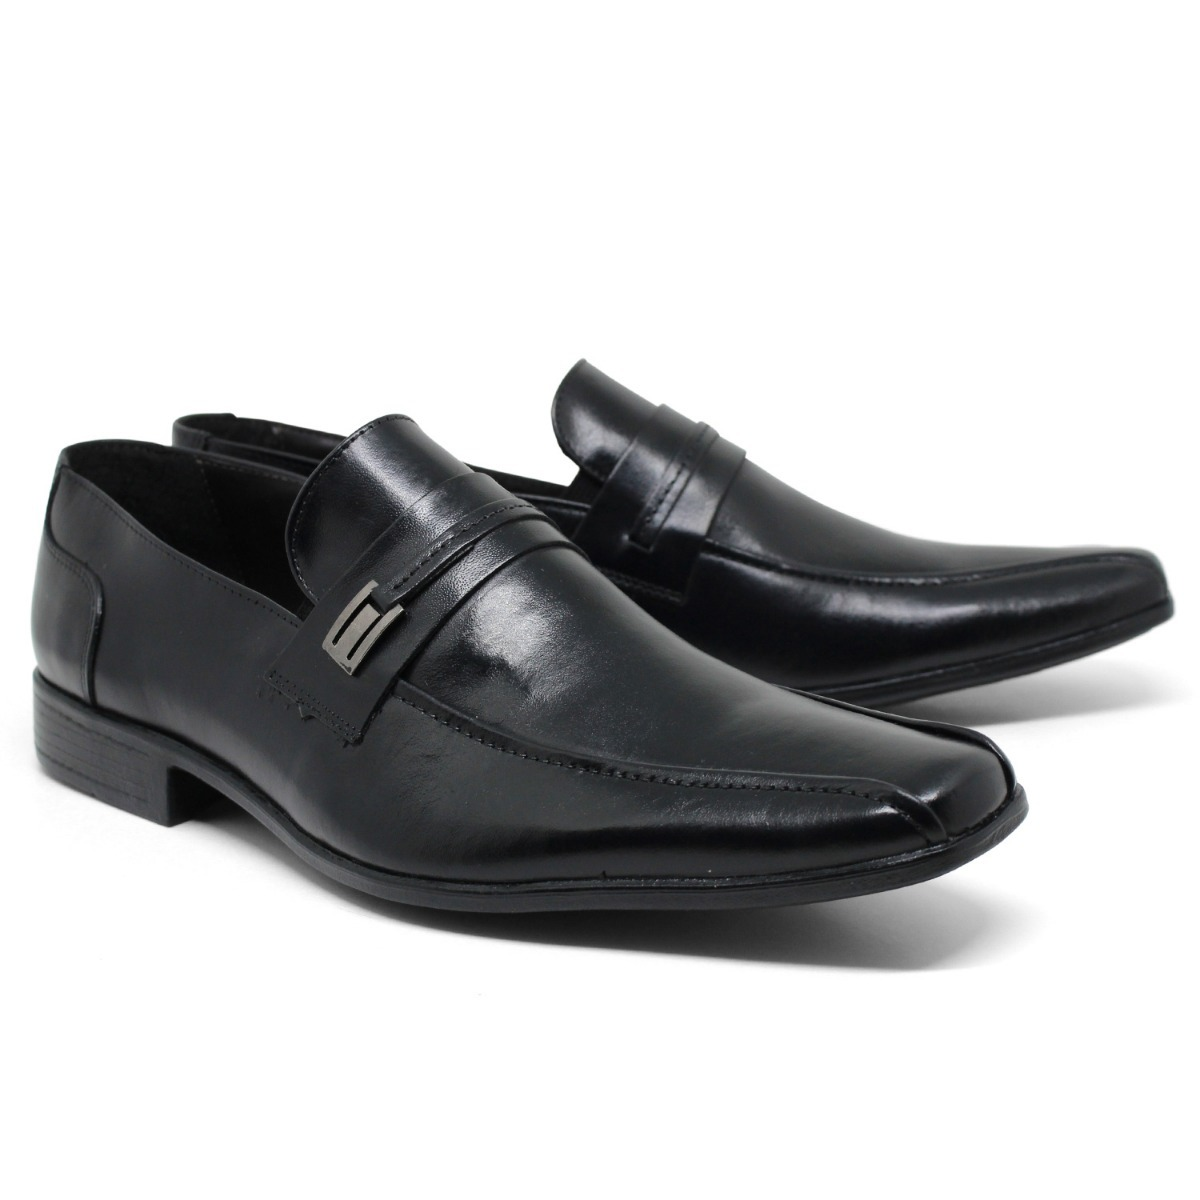 913077bdf8 sapato social masculino leve couro legitimo mocassim fivela. Carregando zoom .